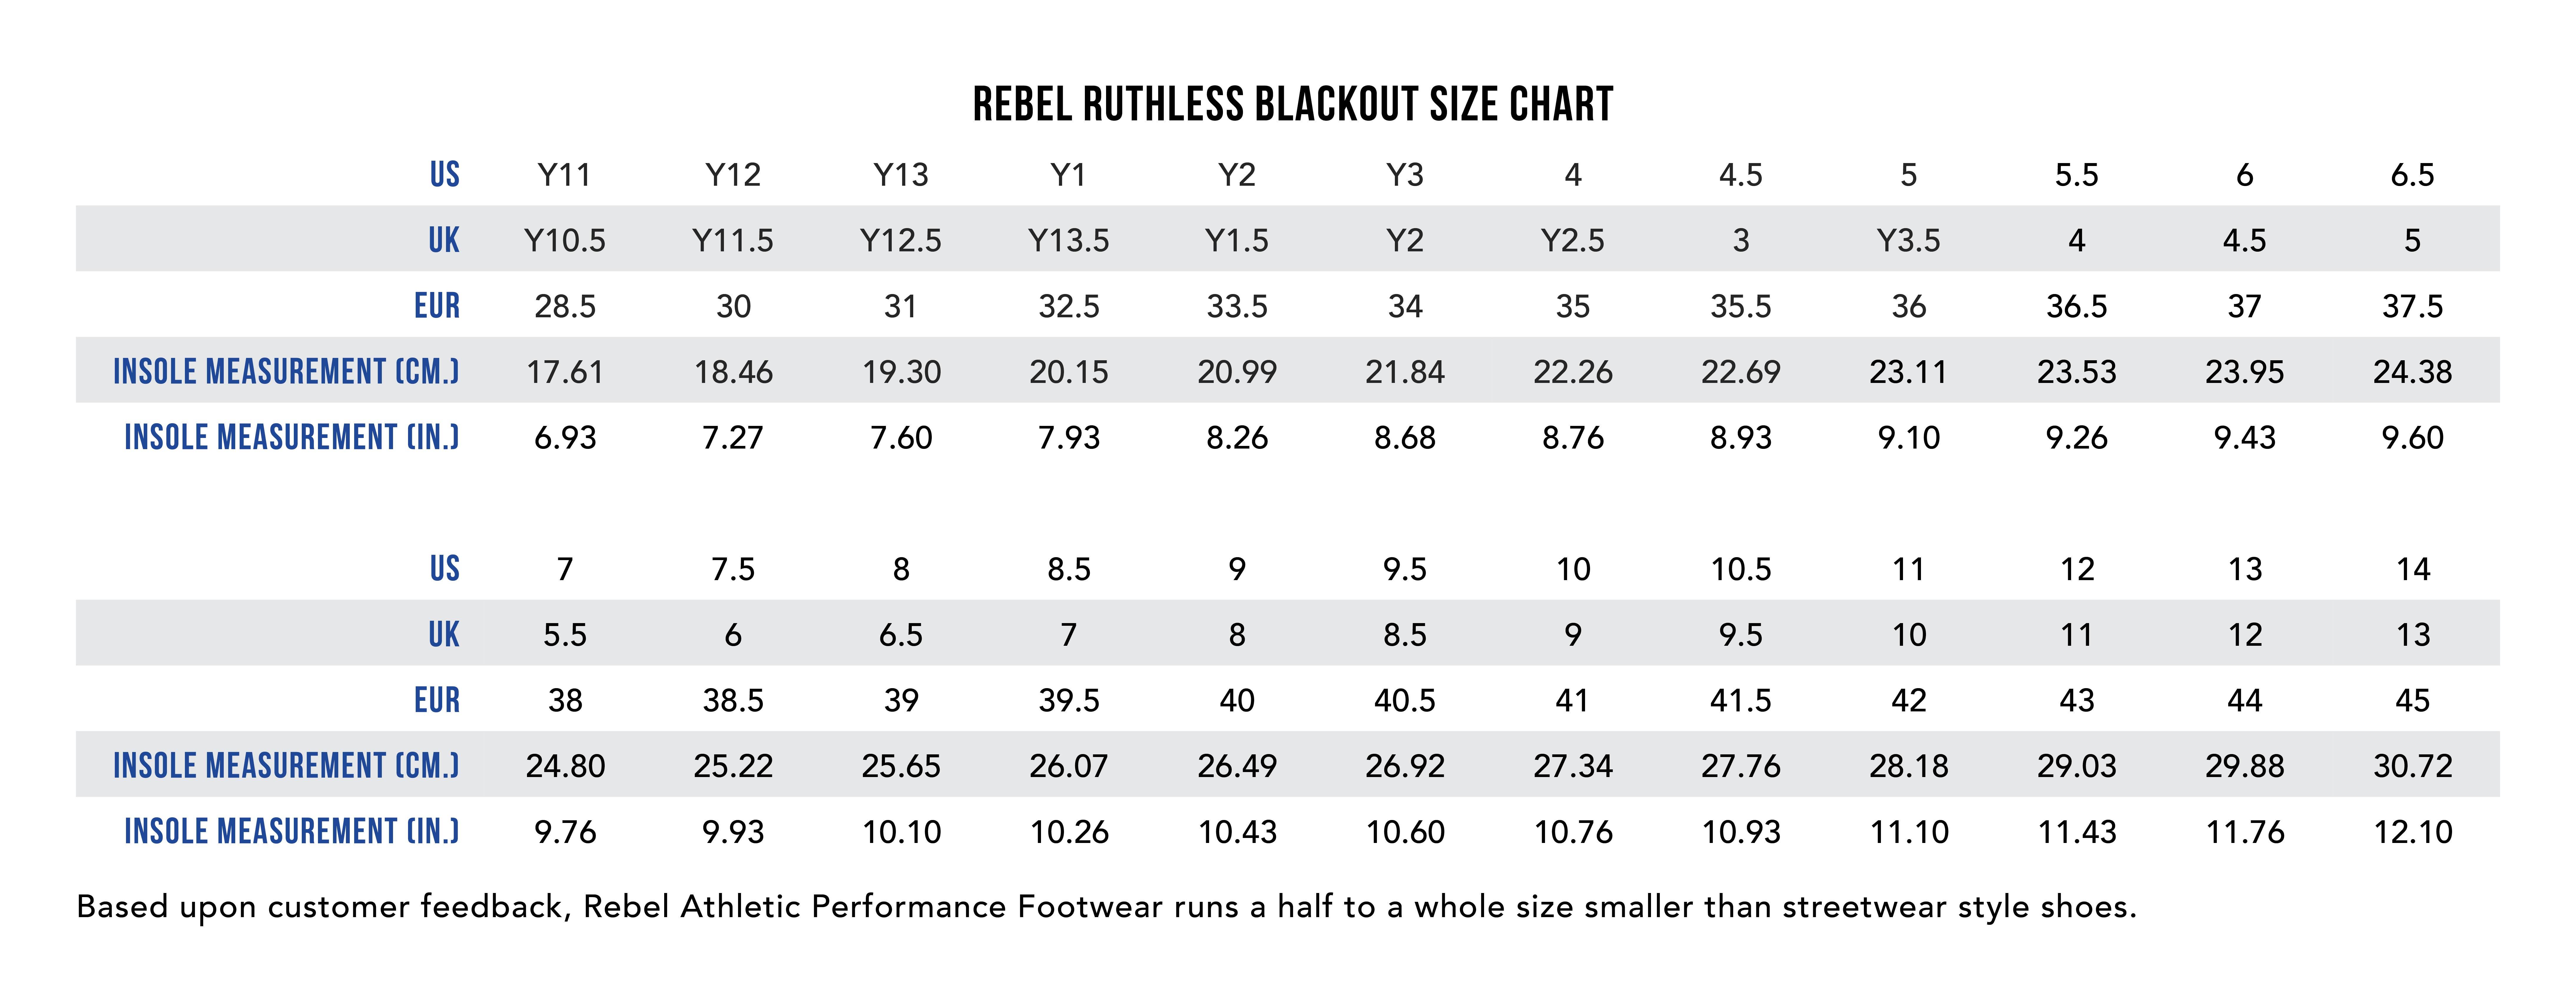 Rebel Ruthless Blackout Size Chart